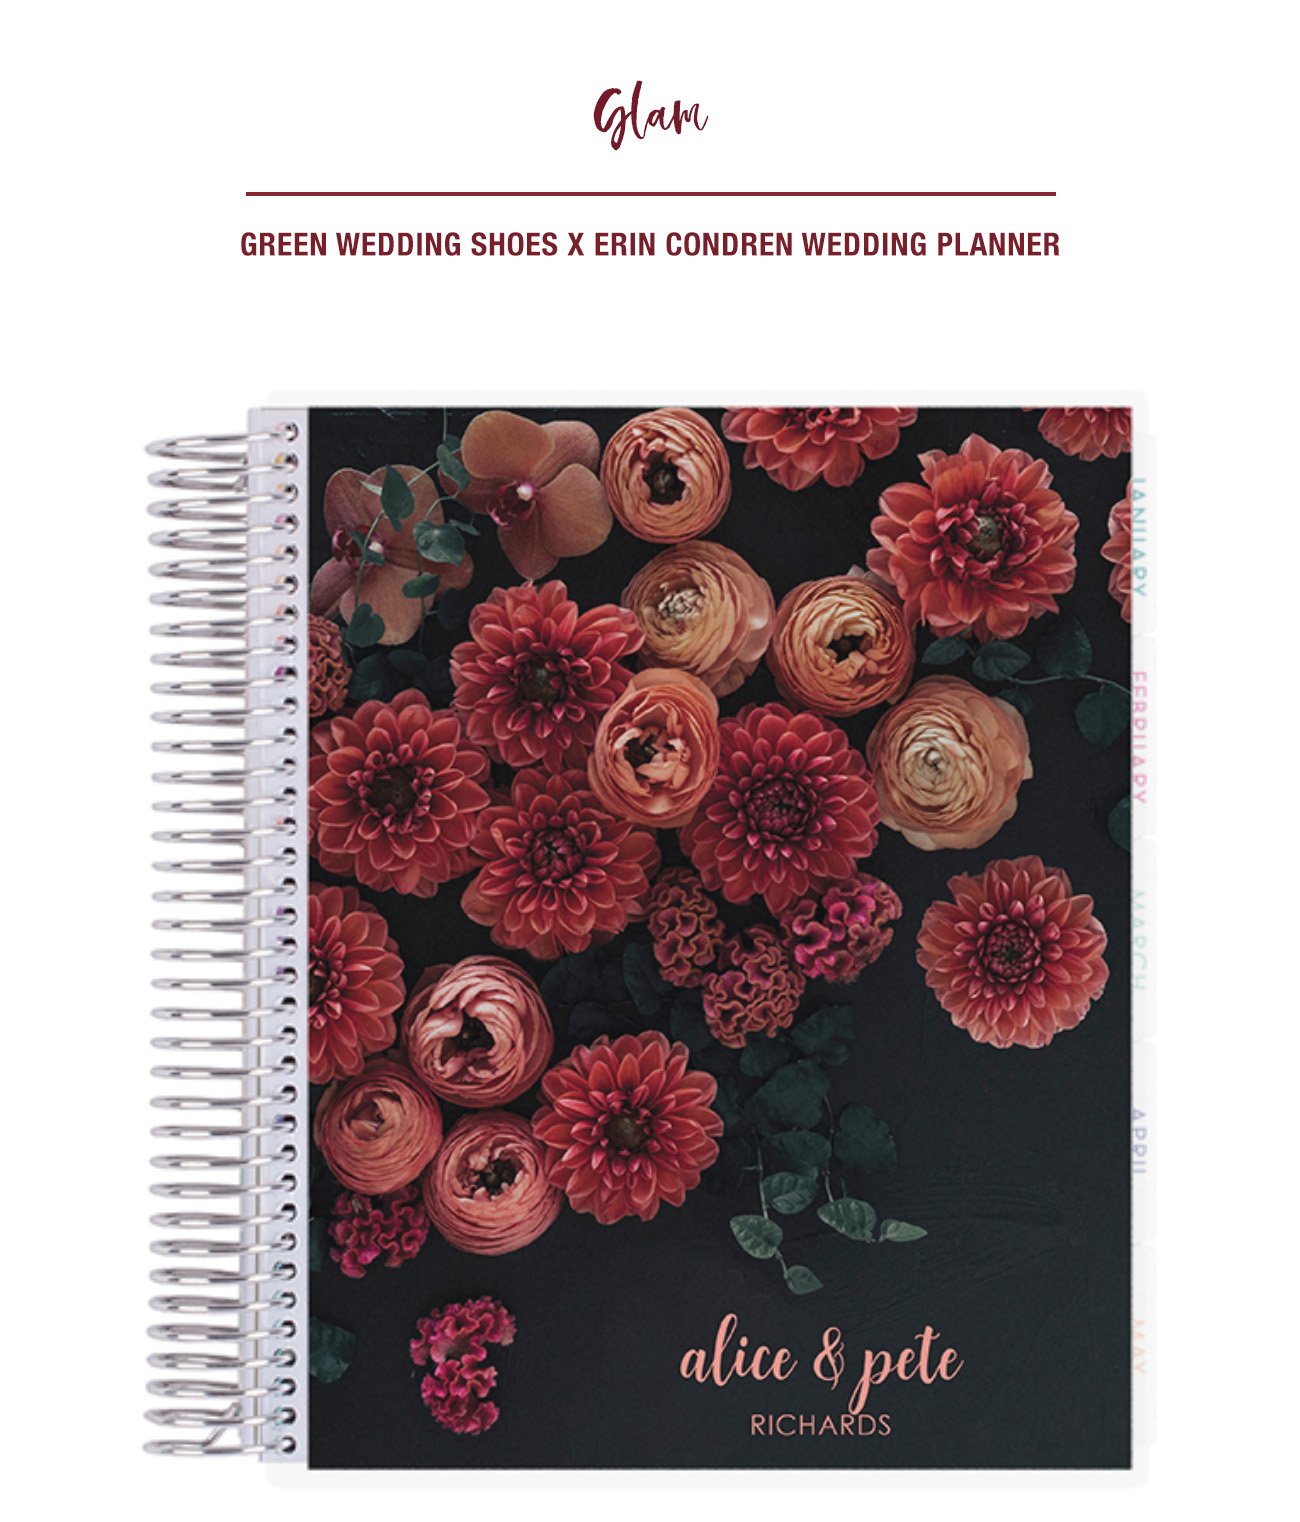 Green Wedding Shoes x Erin Condren Wedding Planner Glam Cover